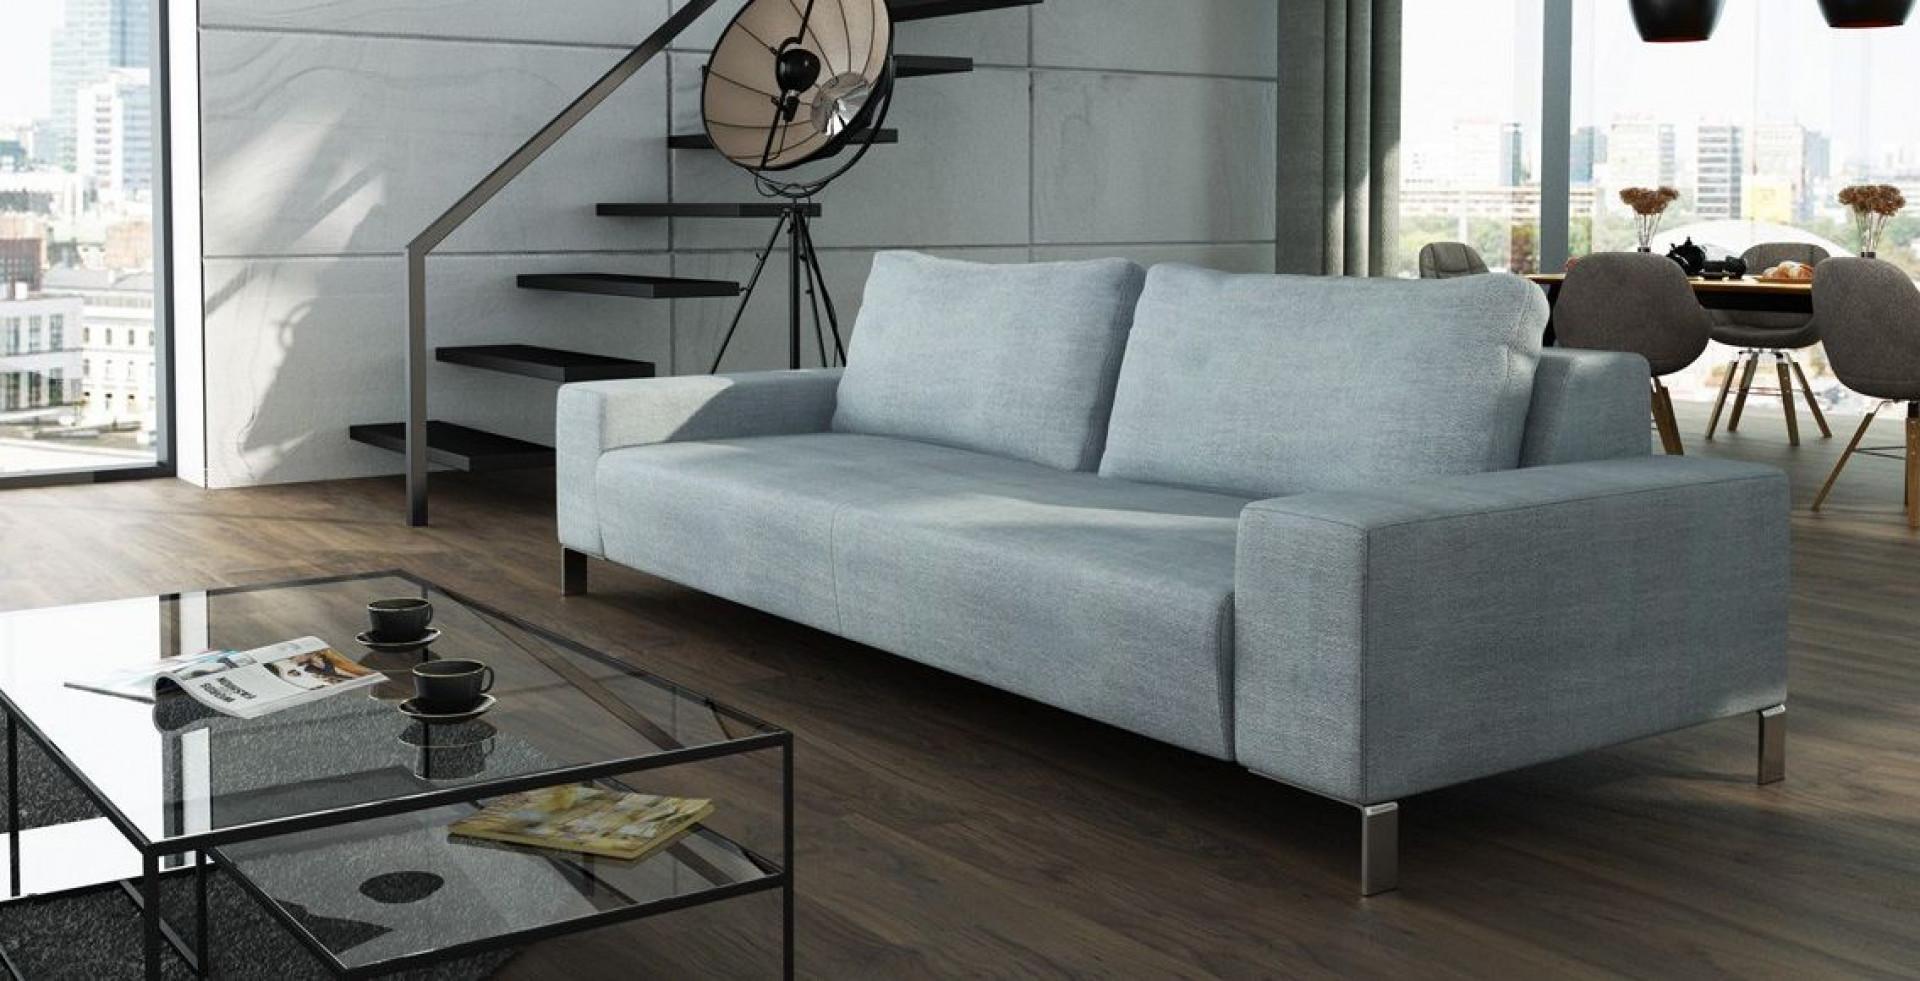 Sofa LeMans. Fot. Adriana Furniture